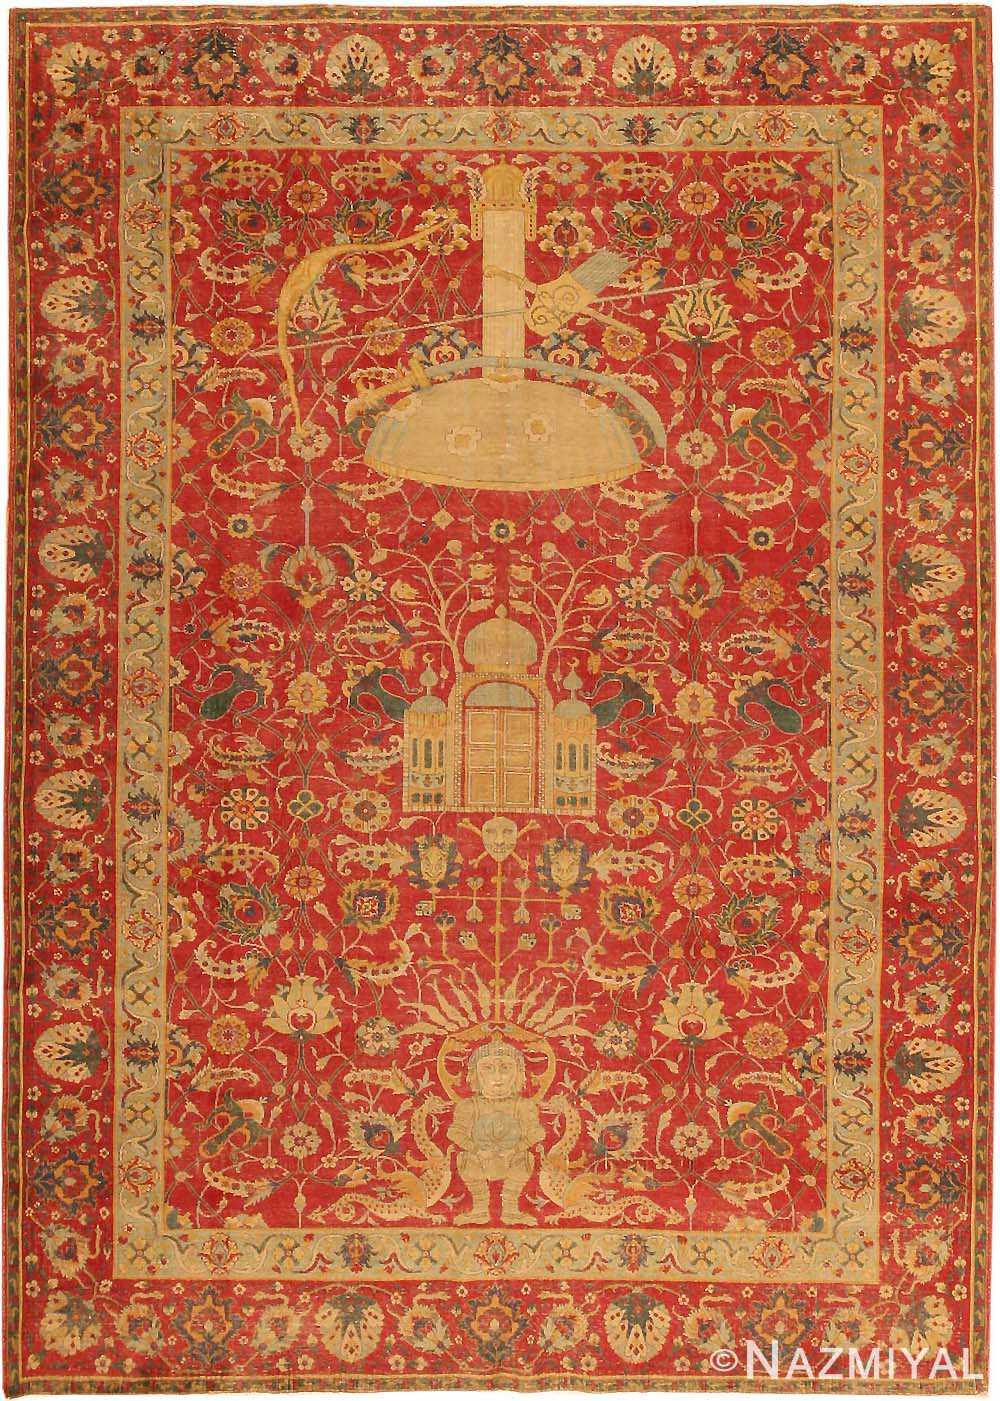 Antique Turkish Tuduc Oriental Rug #786 Nazmiyal